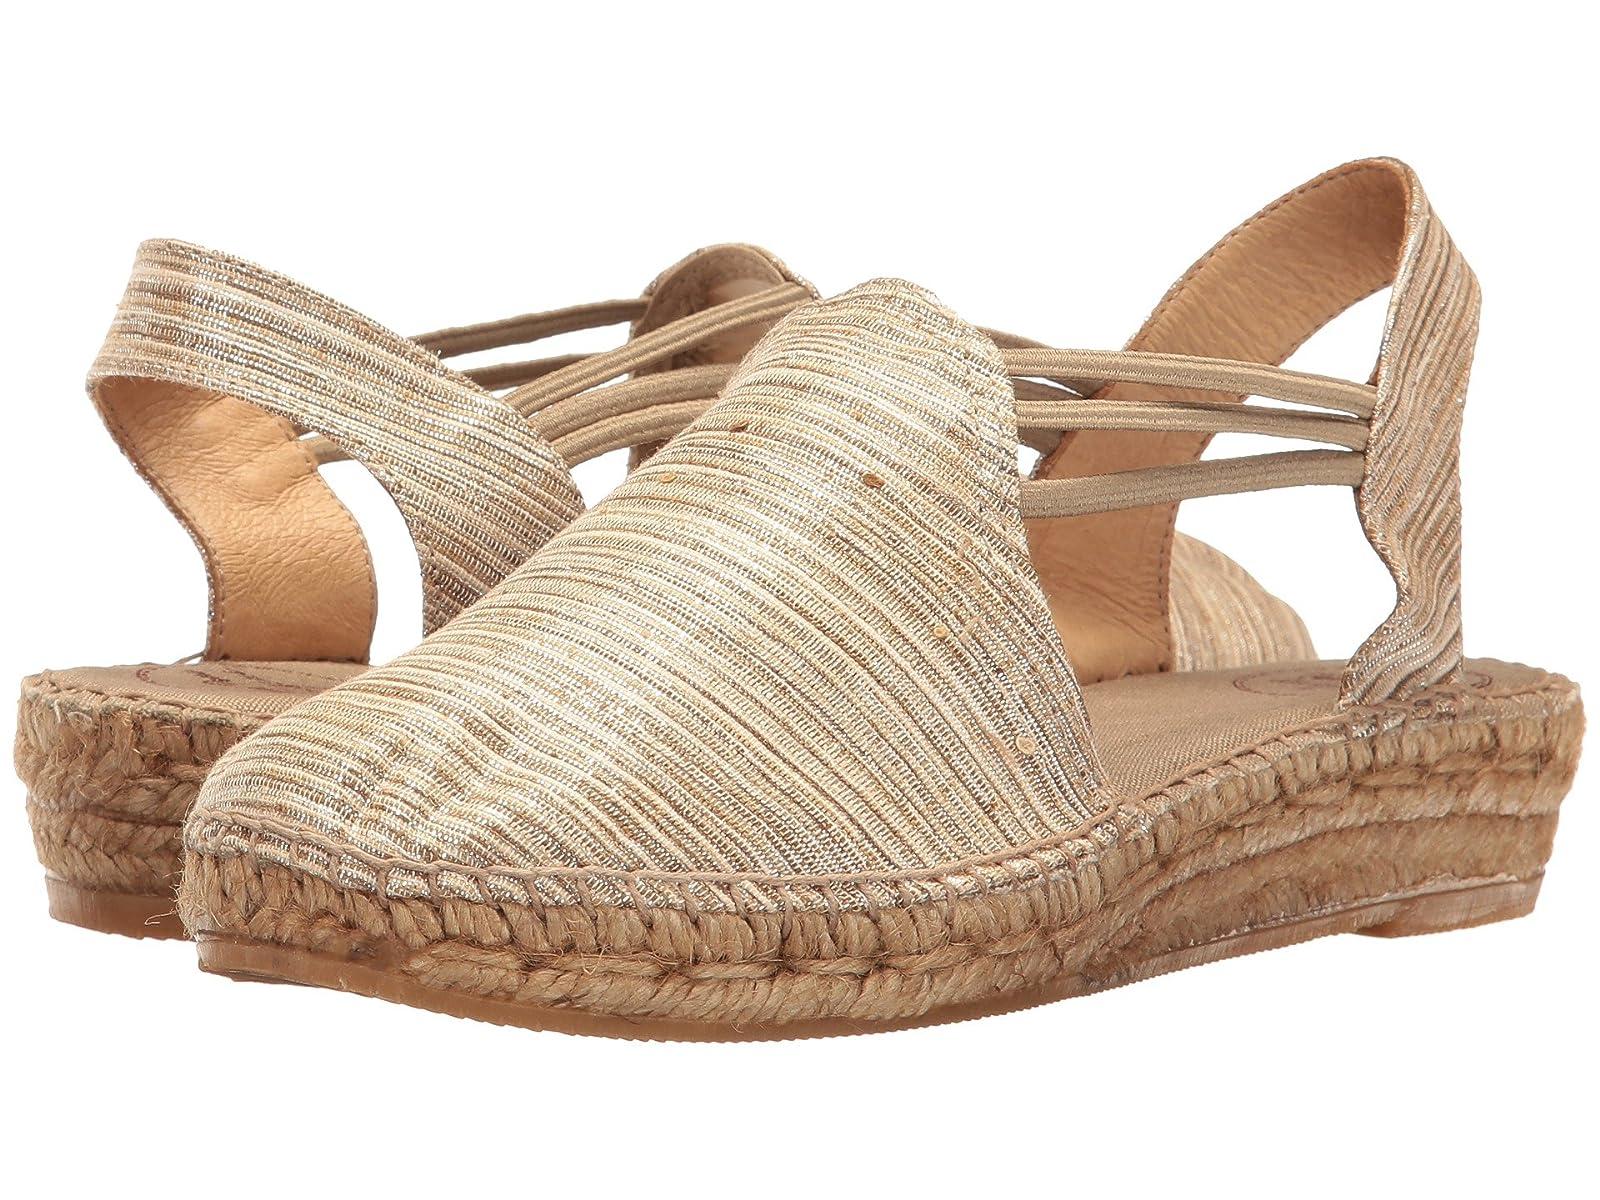 Toni Pons NoaAtmospheric grades have affordable shoes